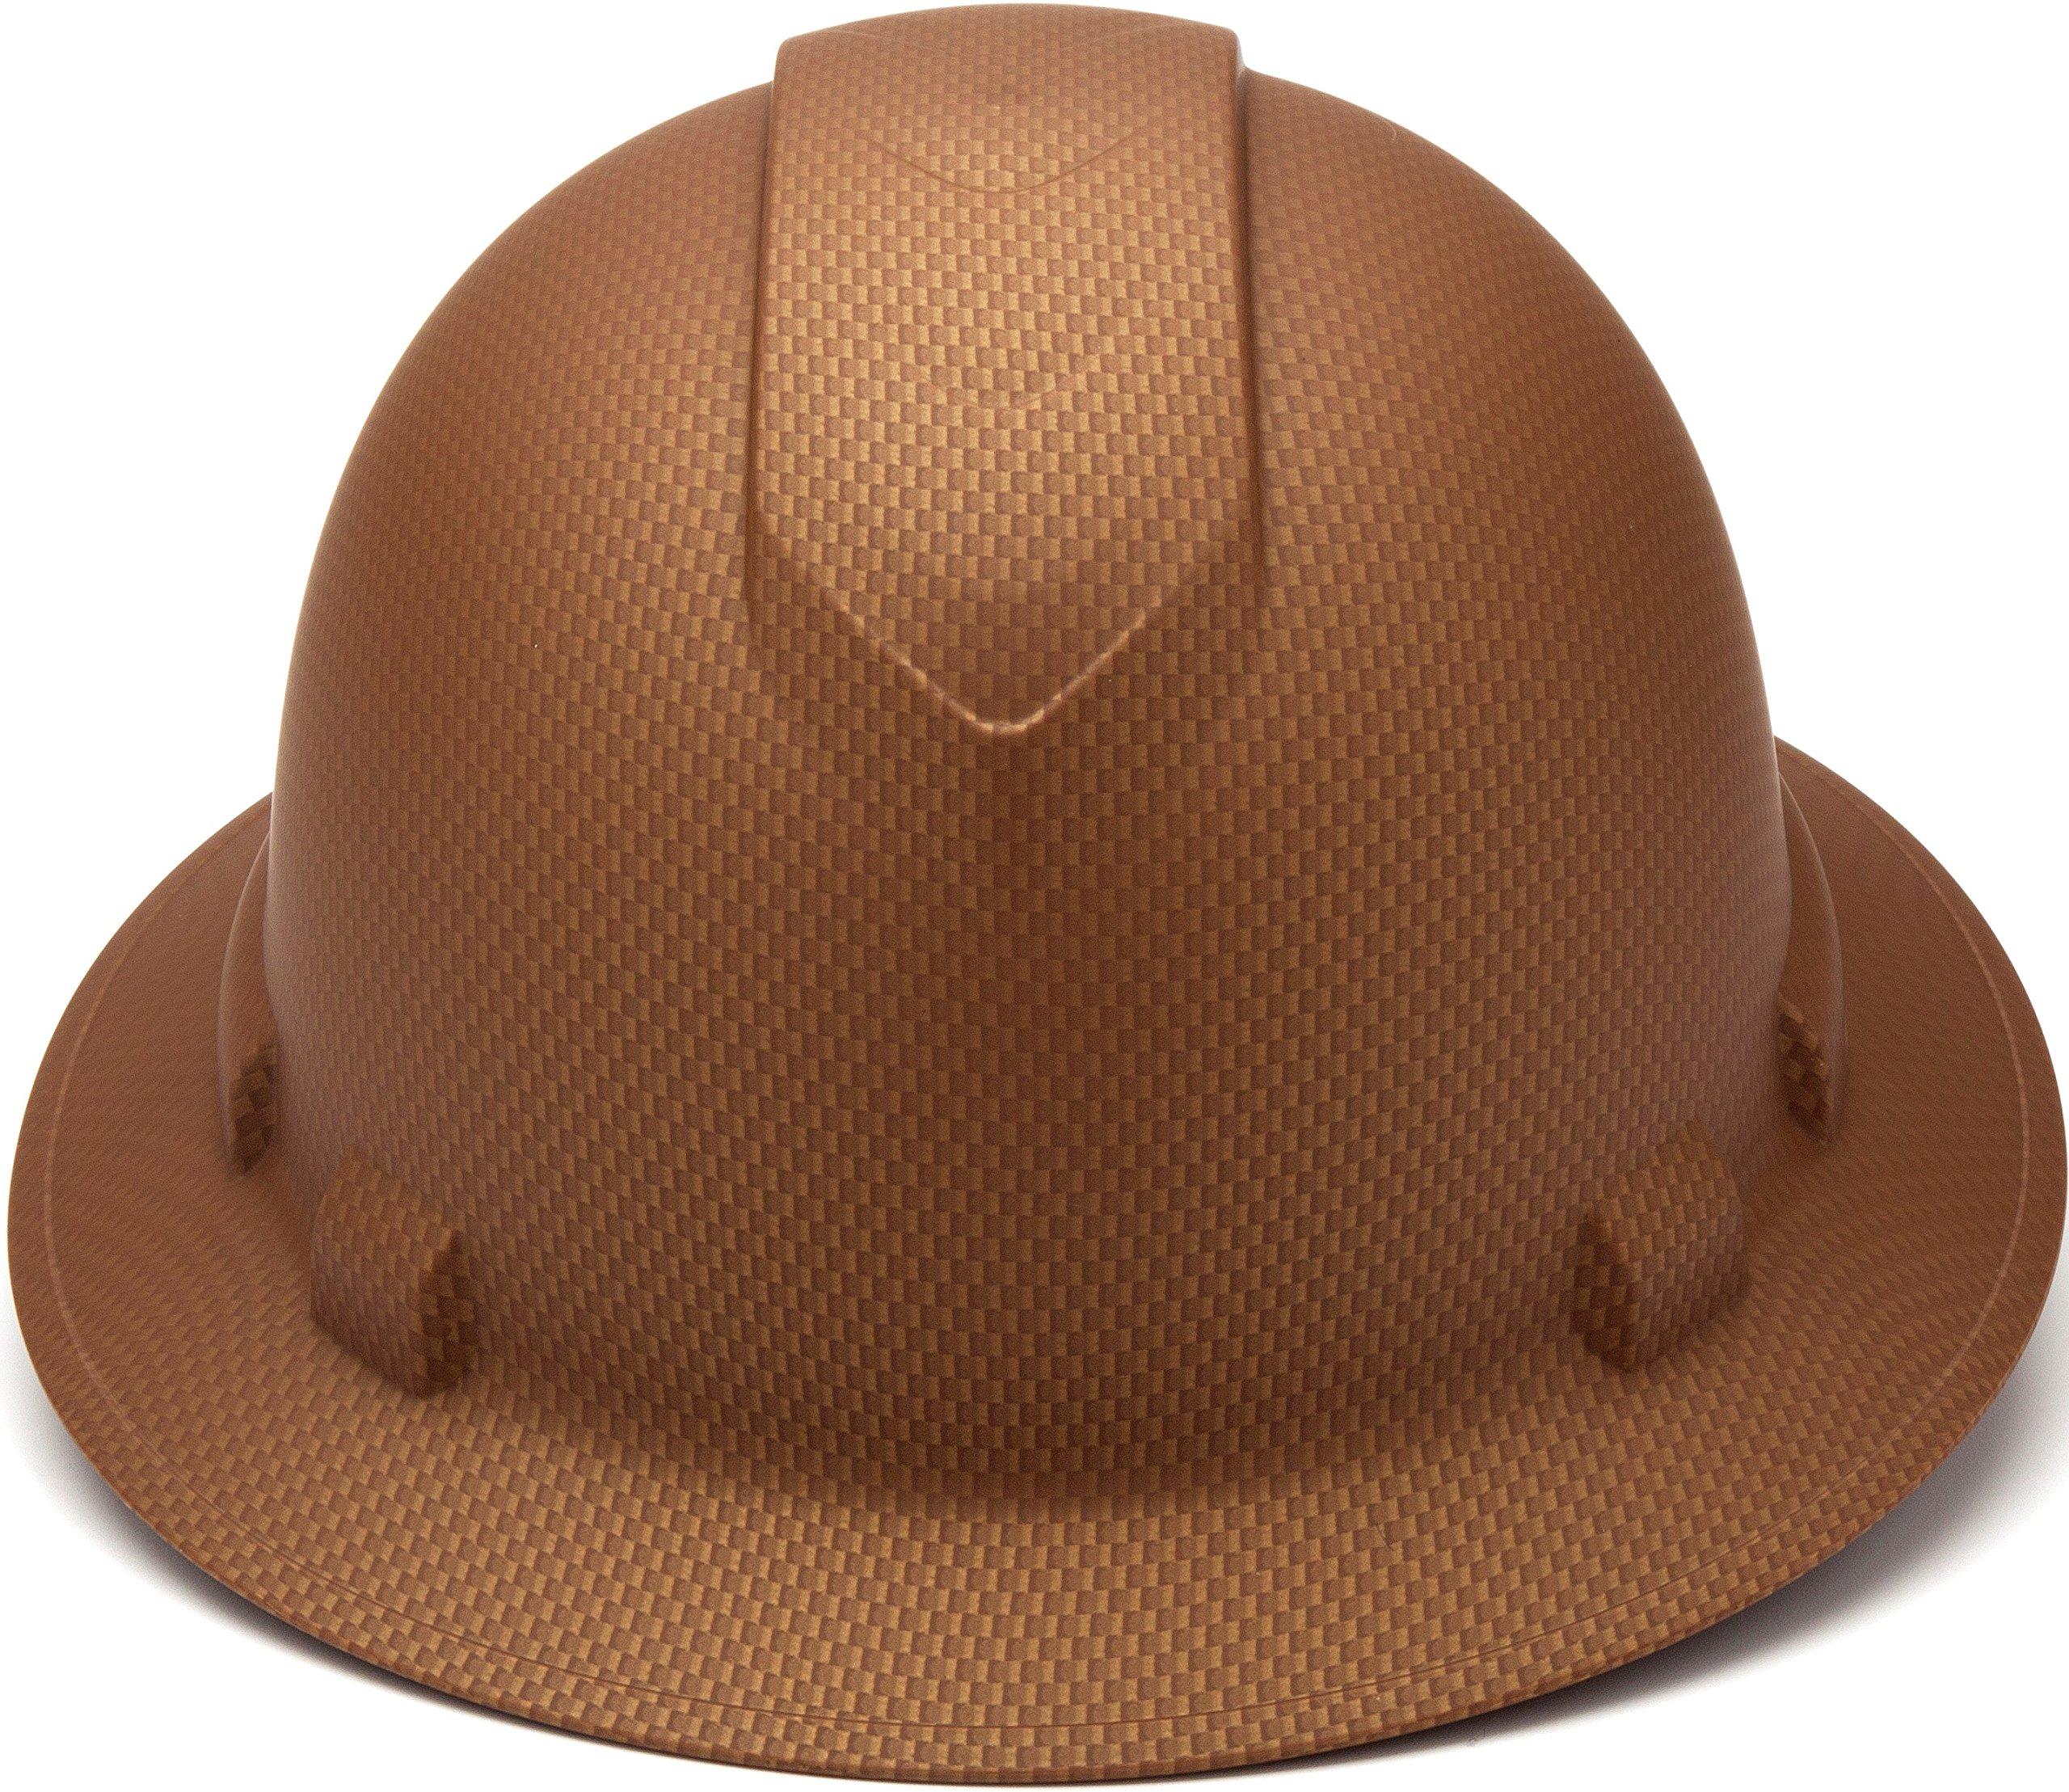 Pyramex Safety PYRAMEX - HP54118 - Copper - Full Brim Ridgeline Full Brim Graphite Pattern Hard Hat, Copper Graphite Pattern by Pyramex Safety (Image #2)